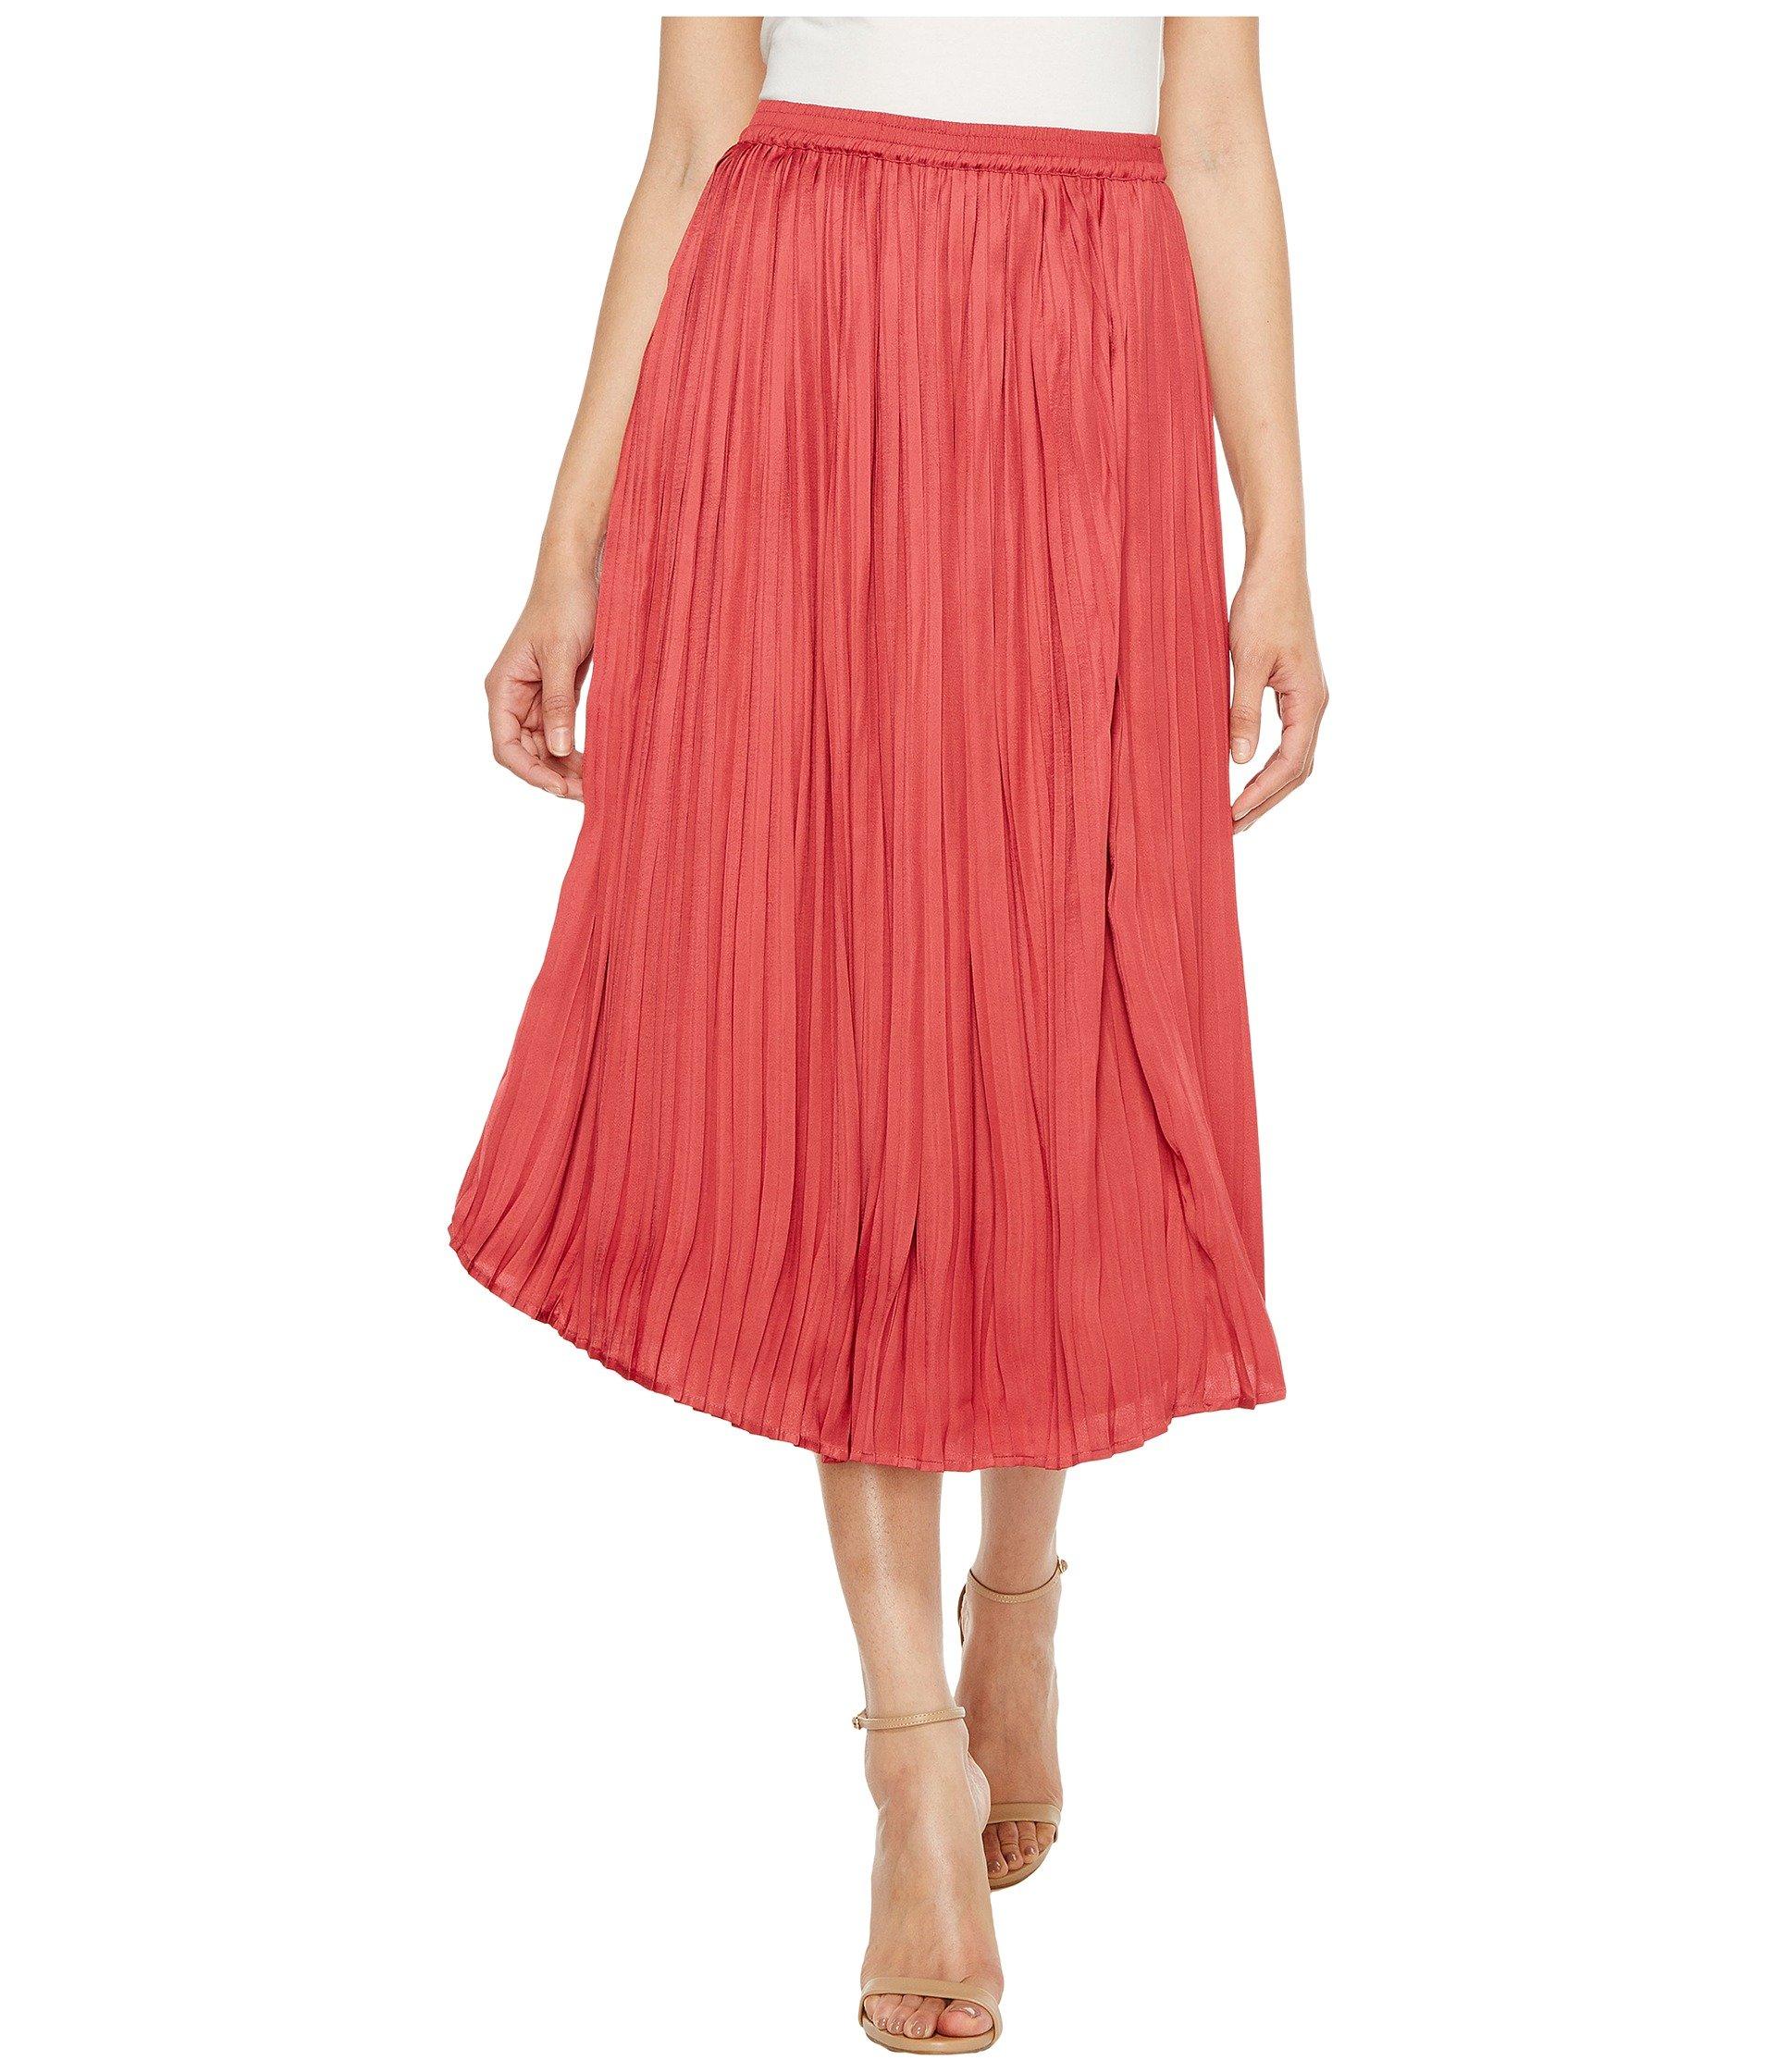 Falda para Mujer Vince Camuto Pleated Rumple Skirt  + Vince Camuto en VeoyCompro.net